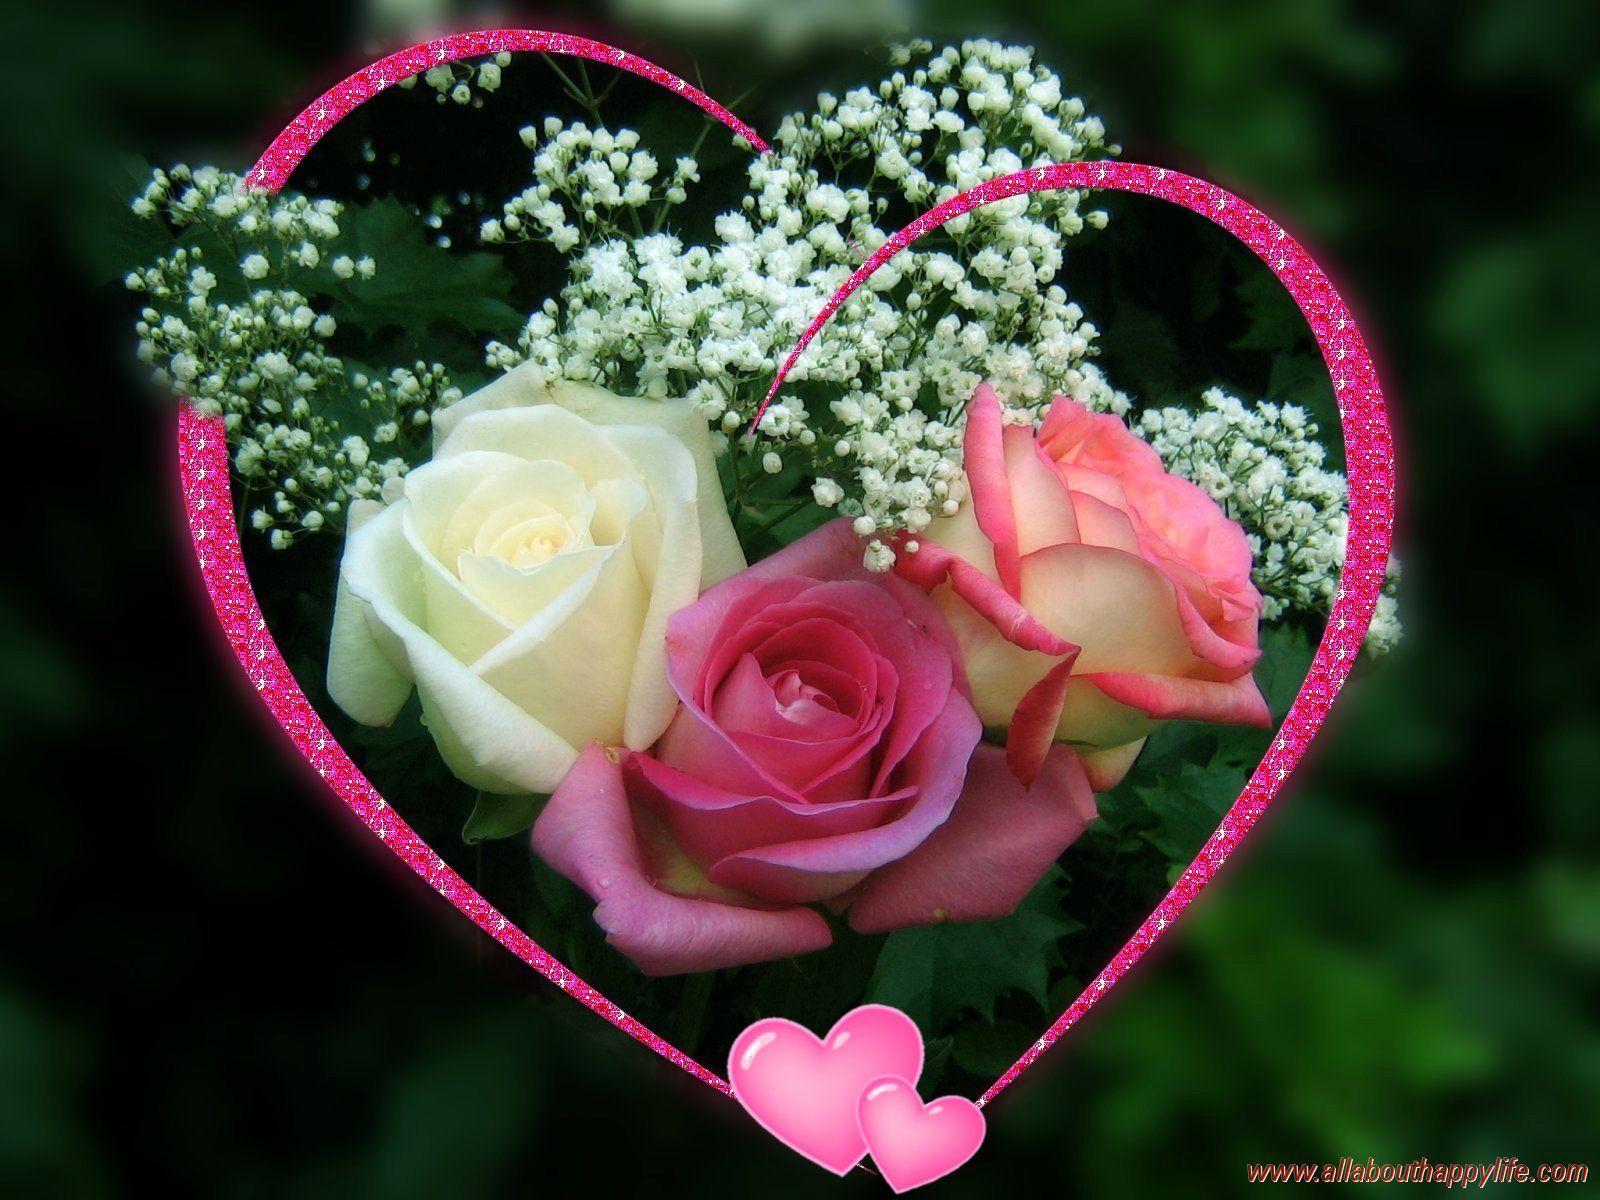 fleur d amour rose fleuriste bulldo flores e primavera. Black Bedroom Furniture Sets. Home Design Ideas